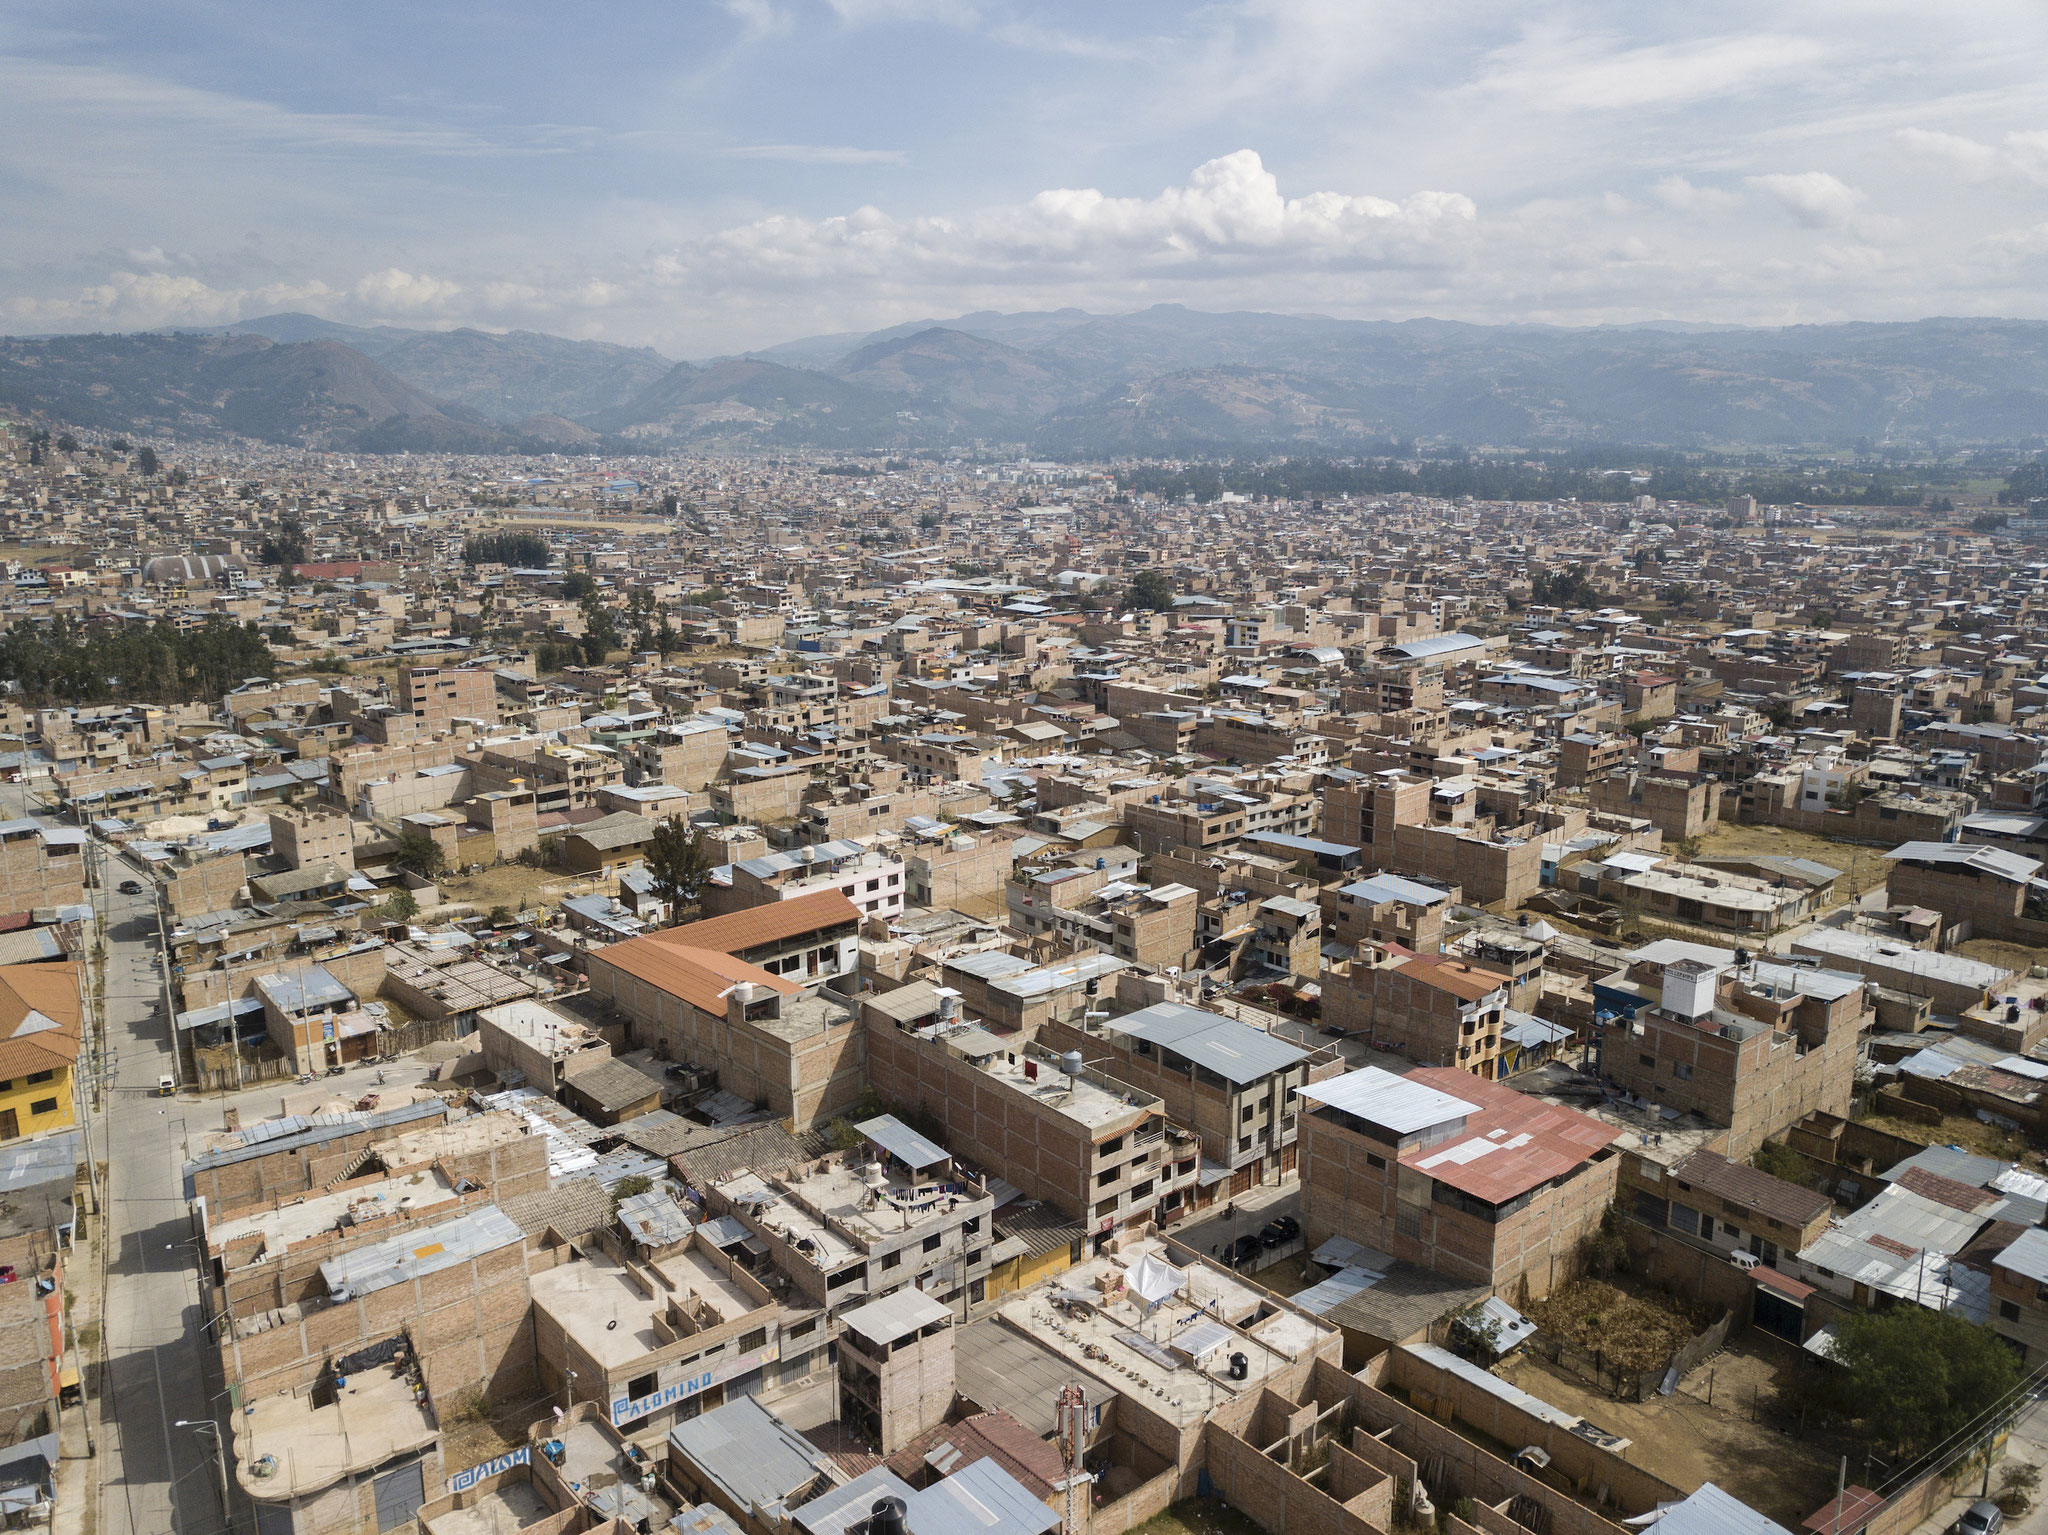 Blick über die peruanische Stadt Cajamarca. Foto: Florian Kopp / Kindermissionswerk